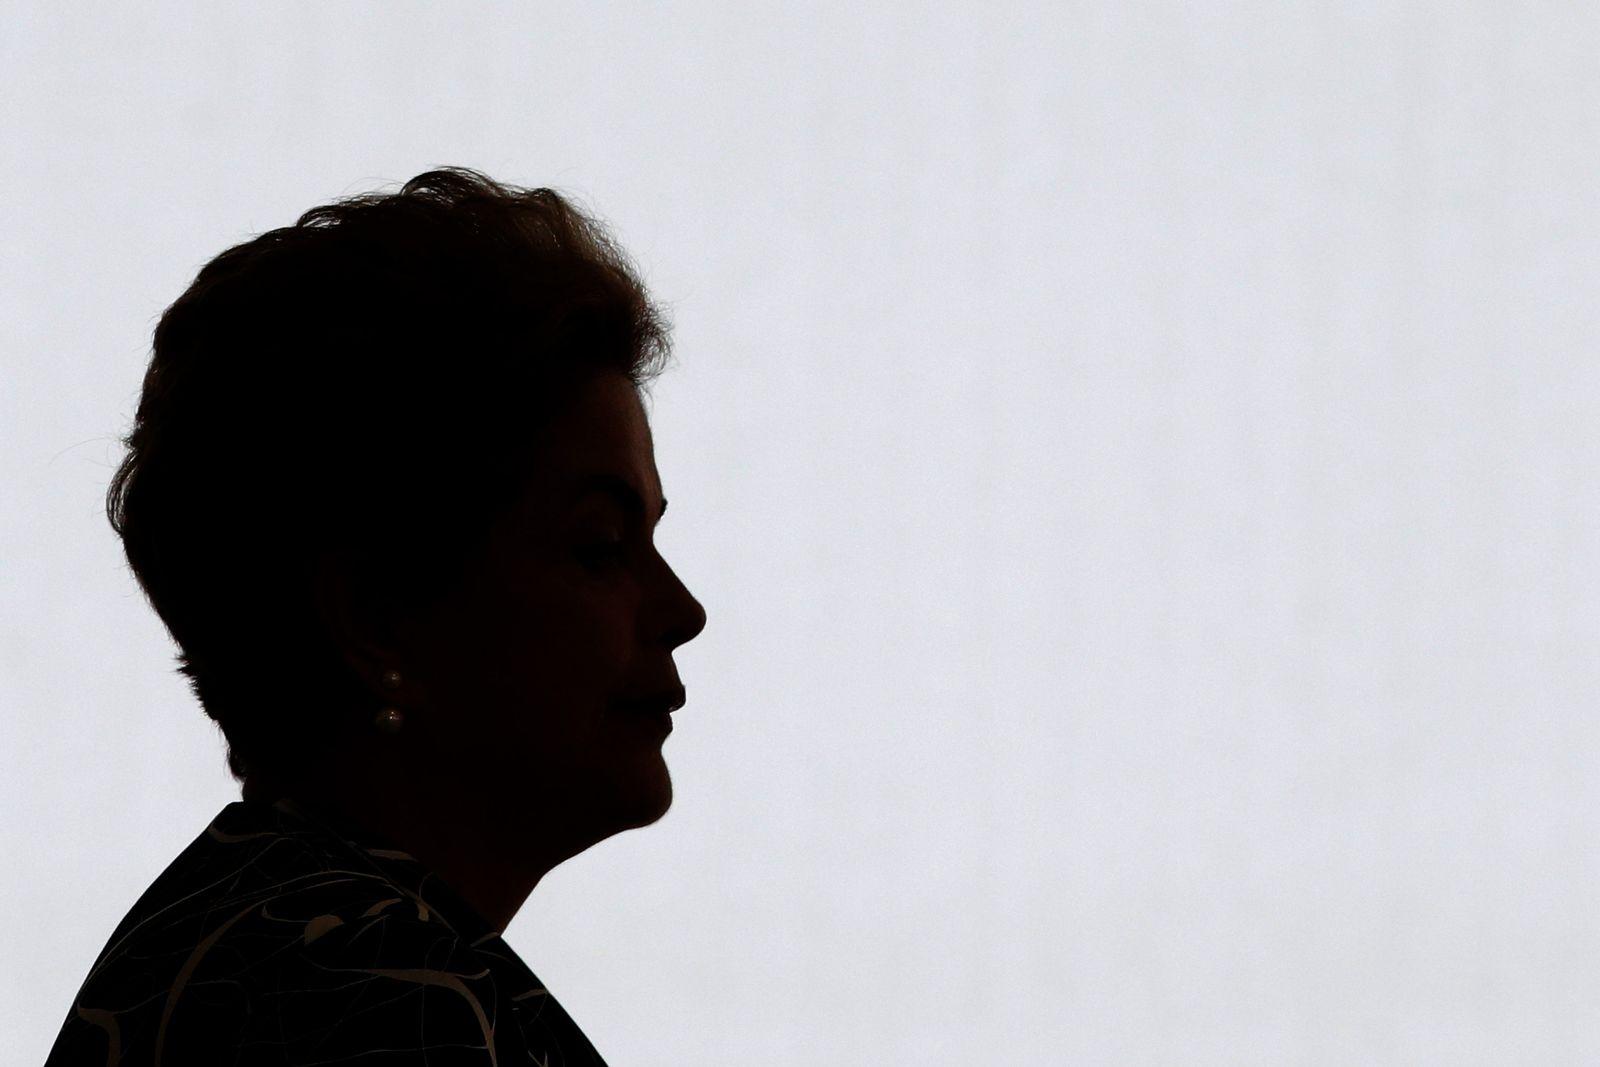 Dilma Rousseff / Brasilien